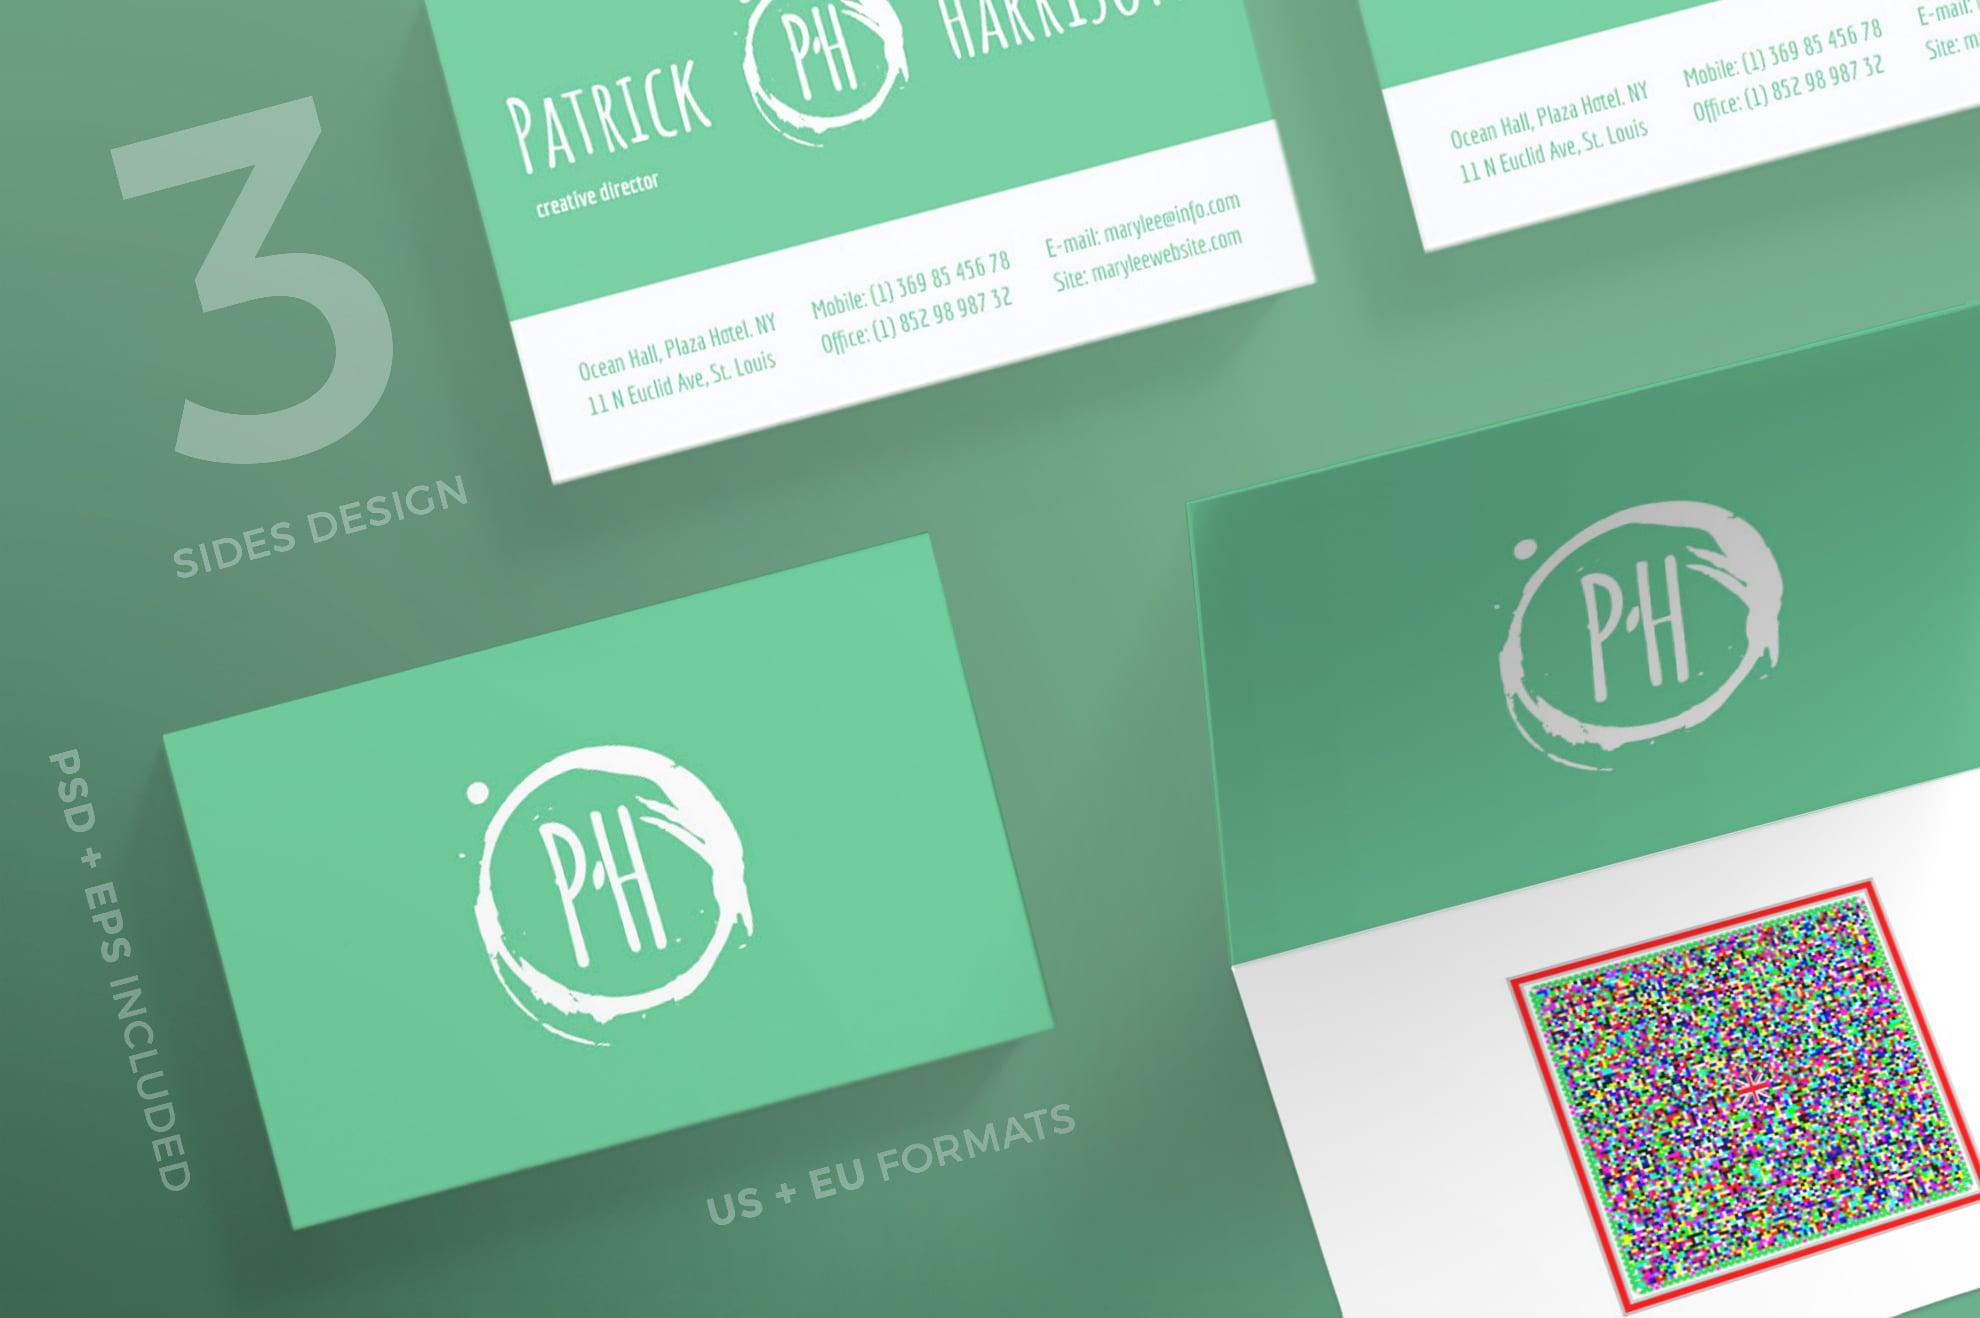 110 in 1 Business Card Bundle - 004 bc patrick harrison 13 0